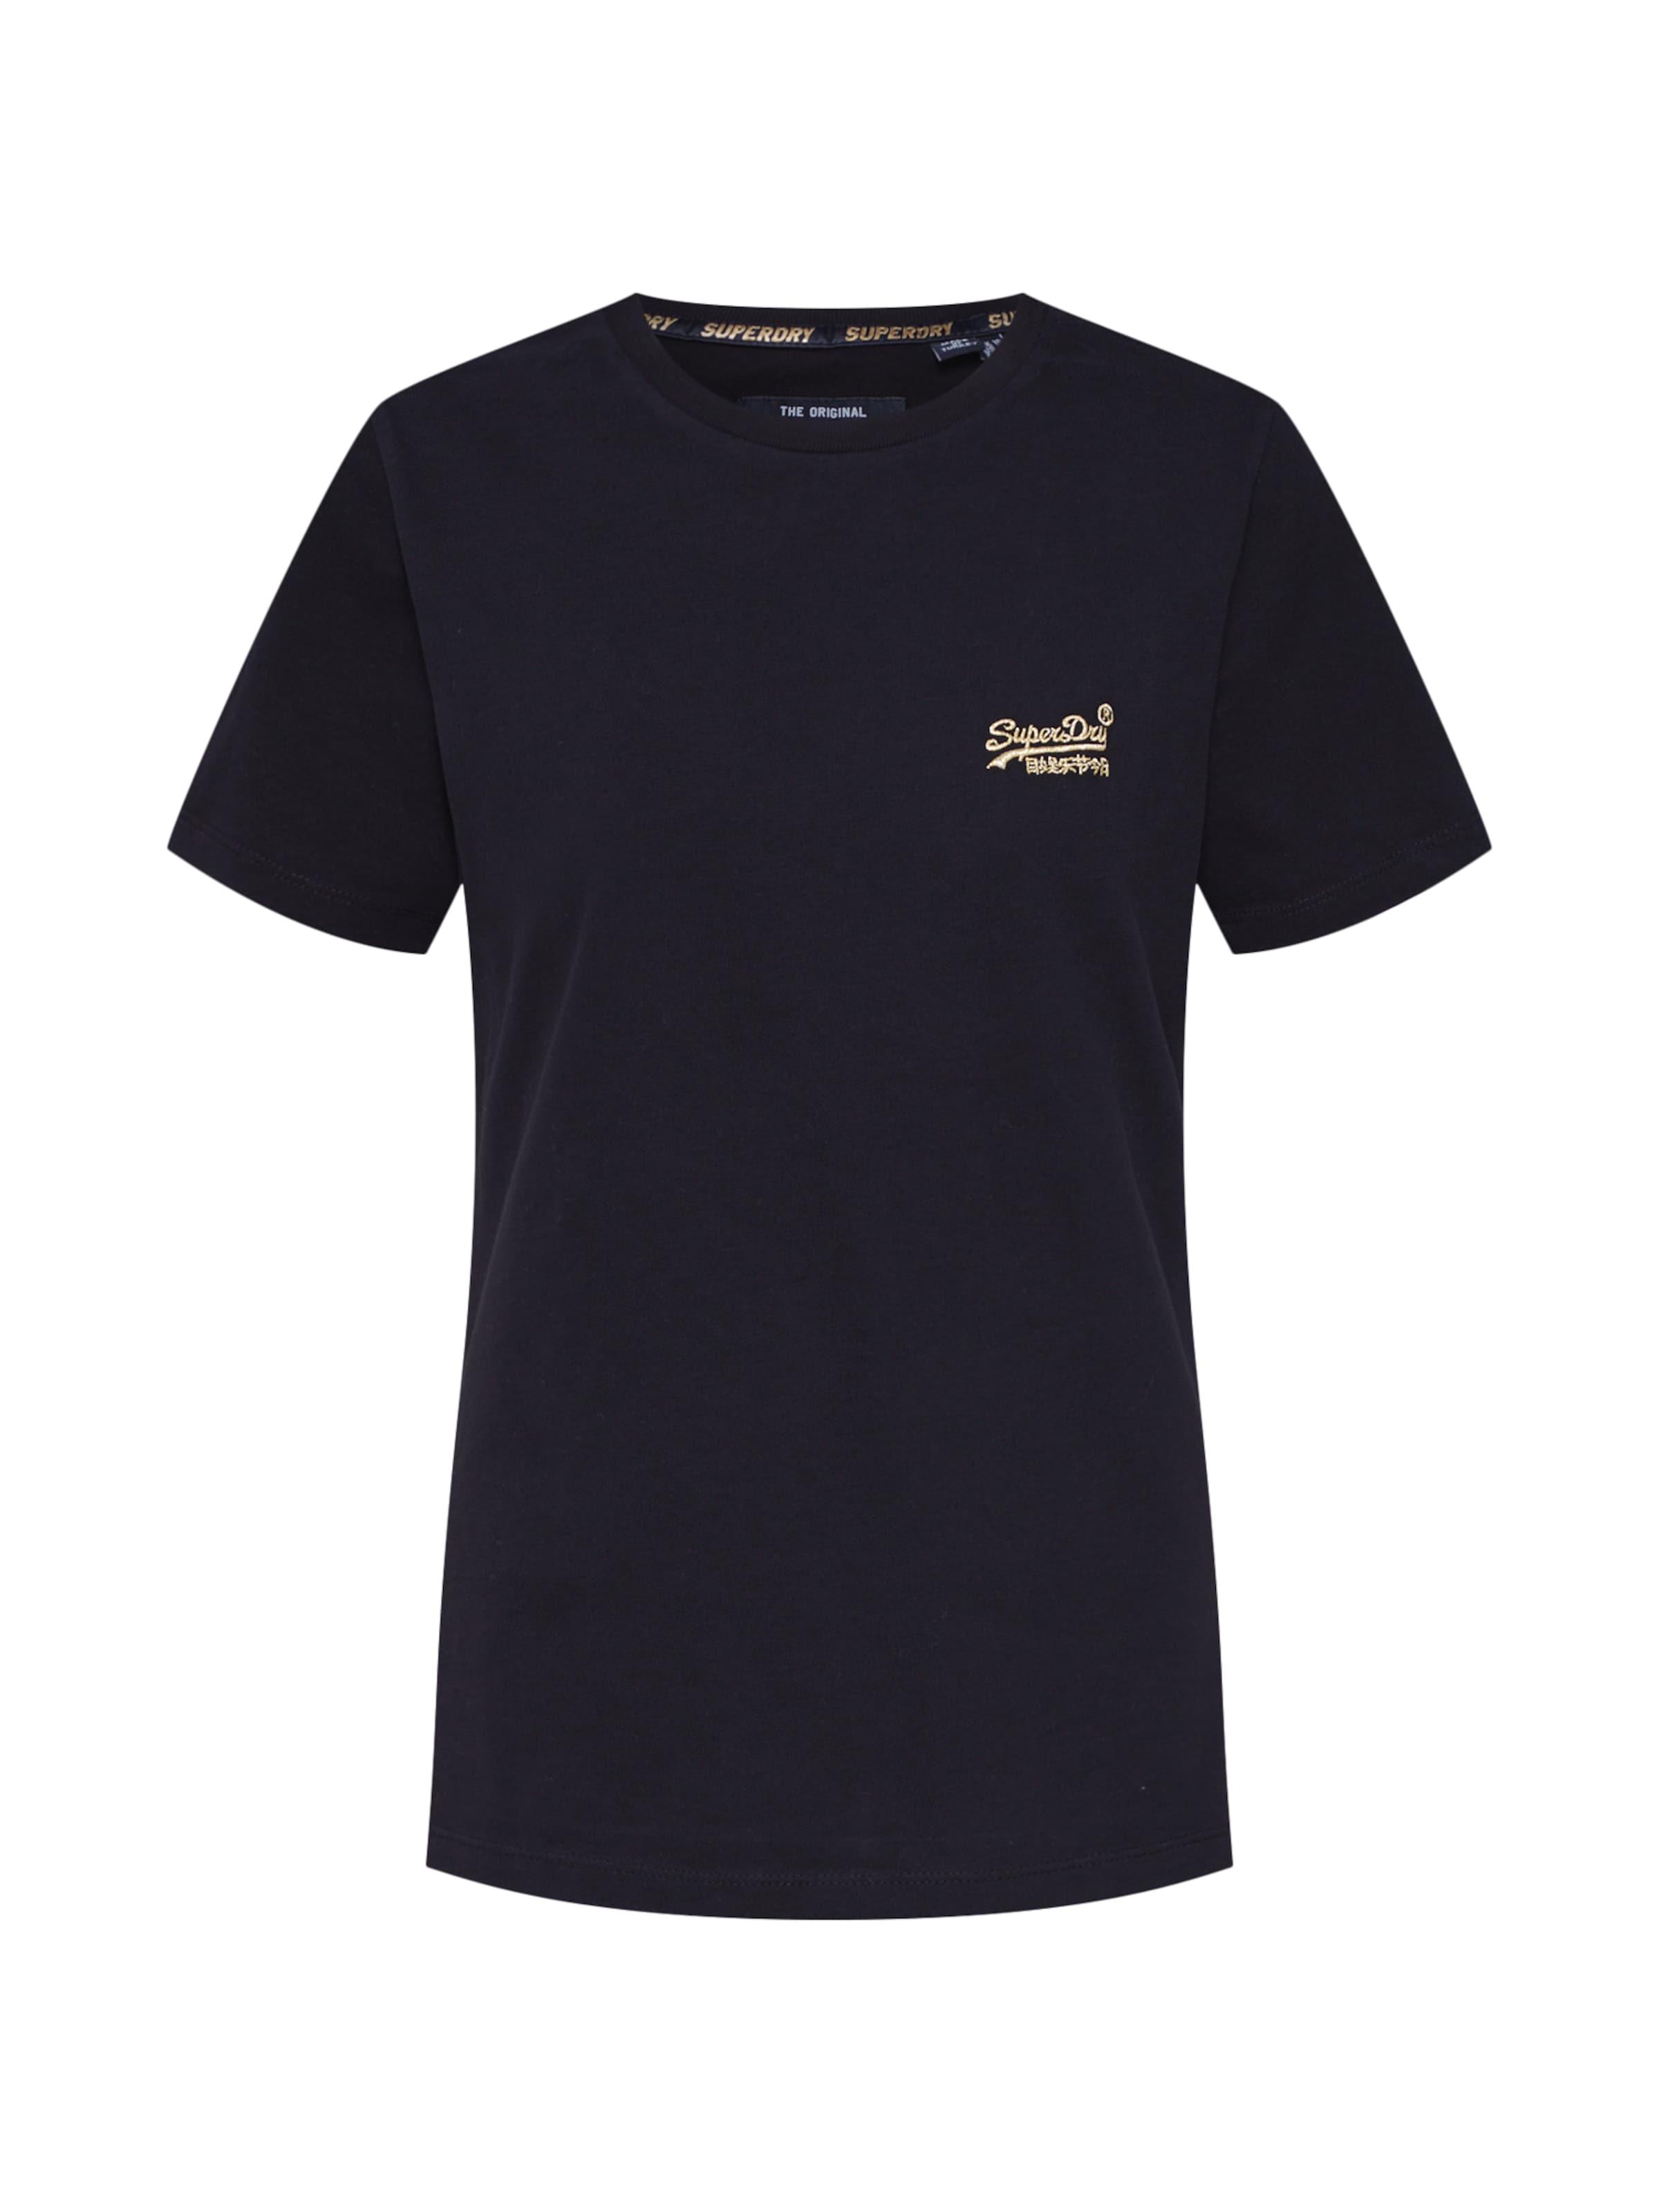 Noir Label Superdry En shirt Elite T 'core Orange Tee' 4j5ARL